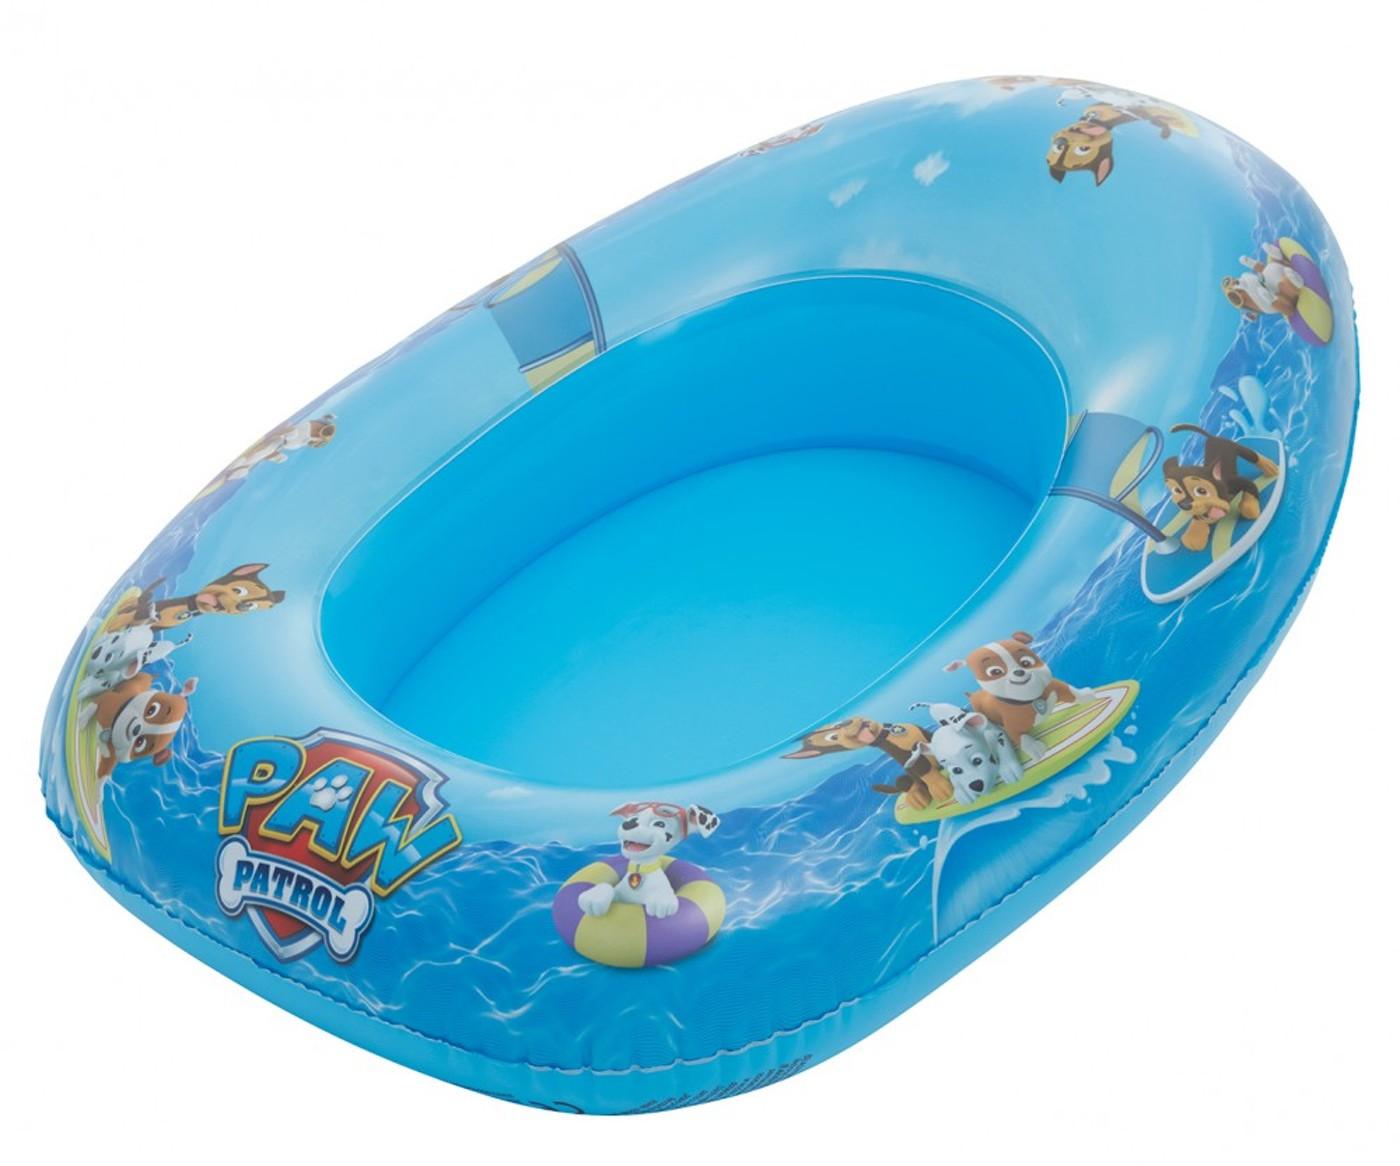 HAPPY PEOPLE Paw Patrol Kinderboot - Kinder